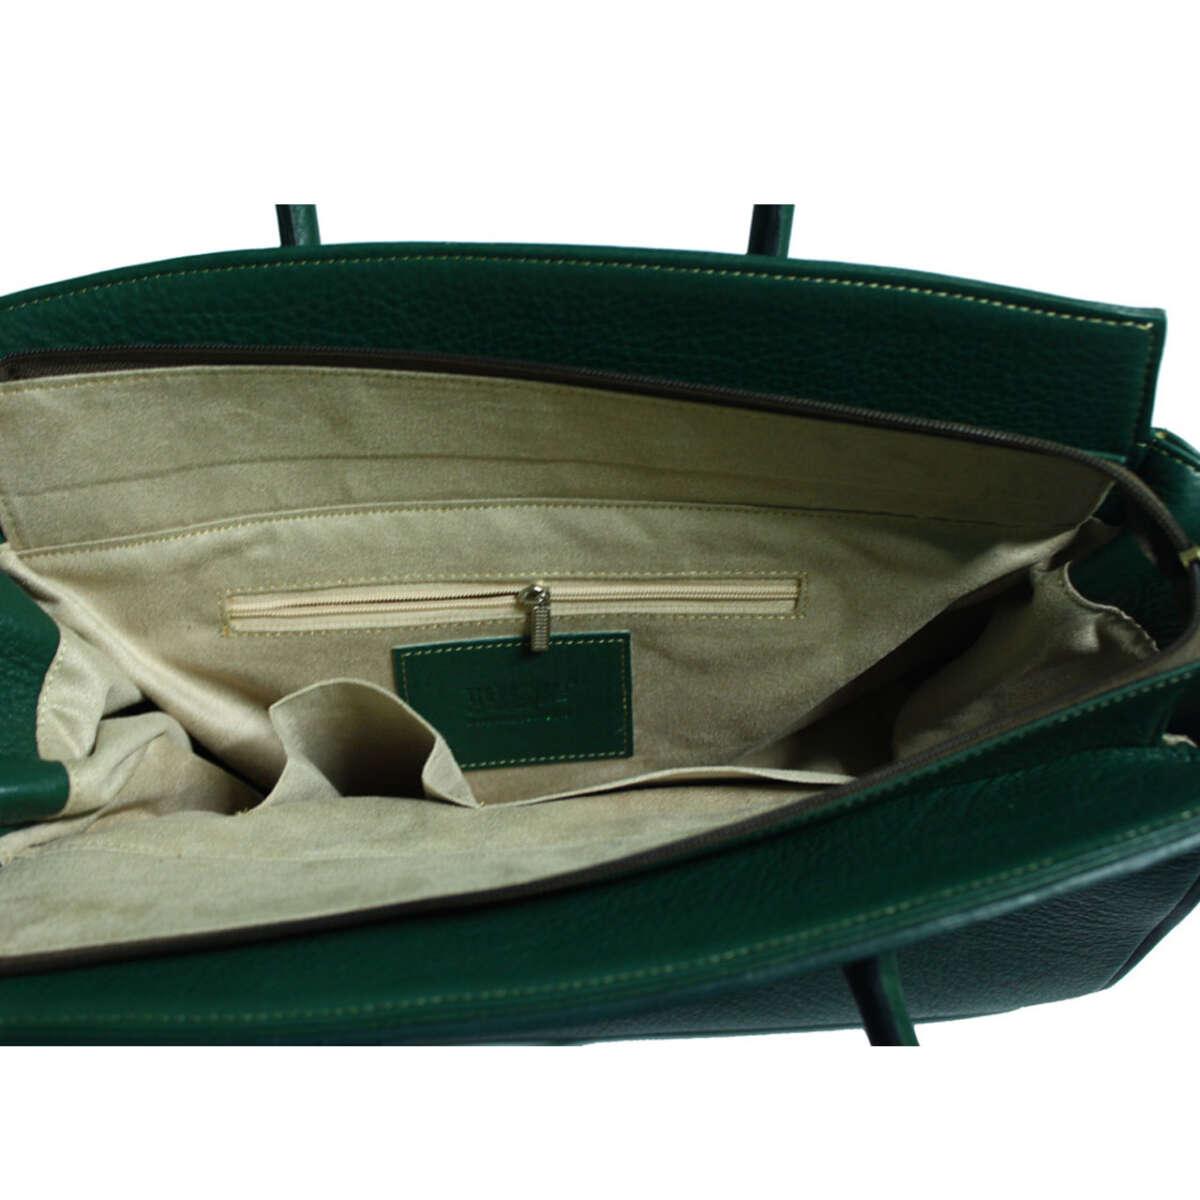 Túi xách nữ da bò B009b